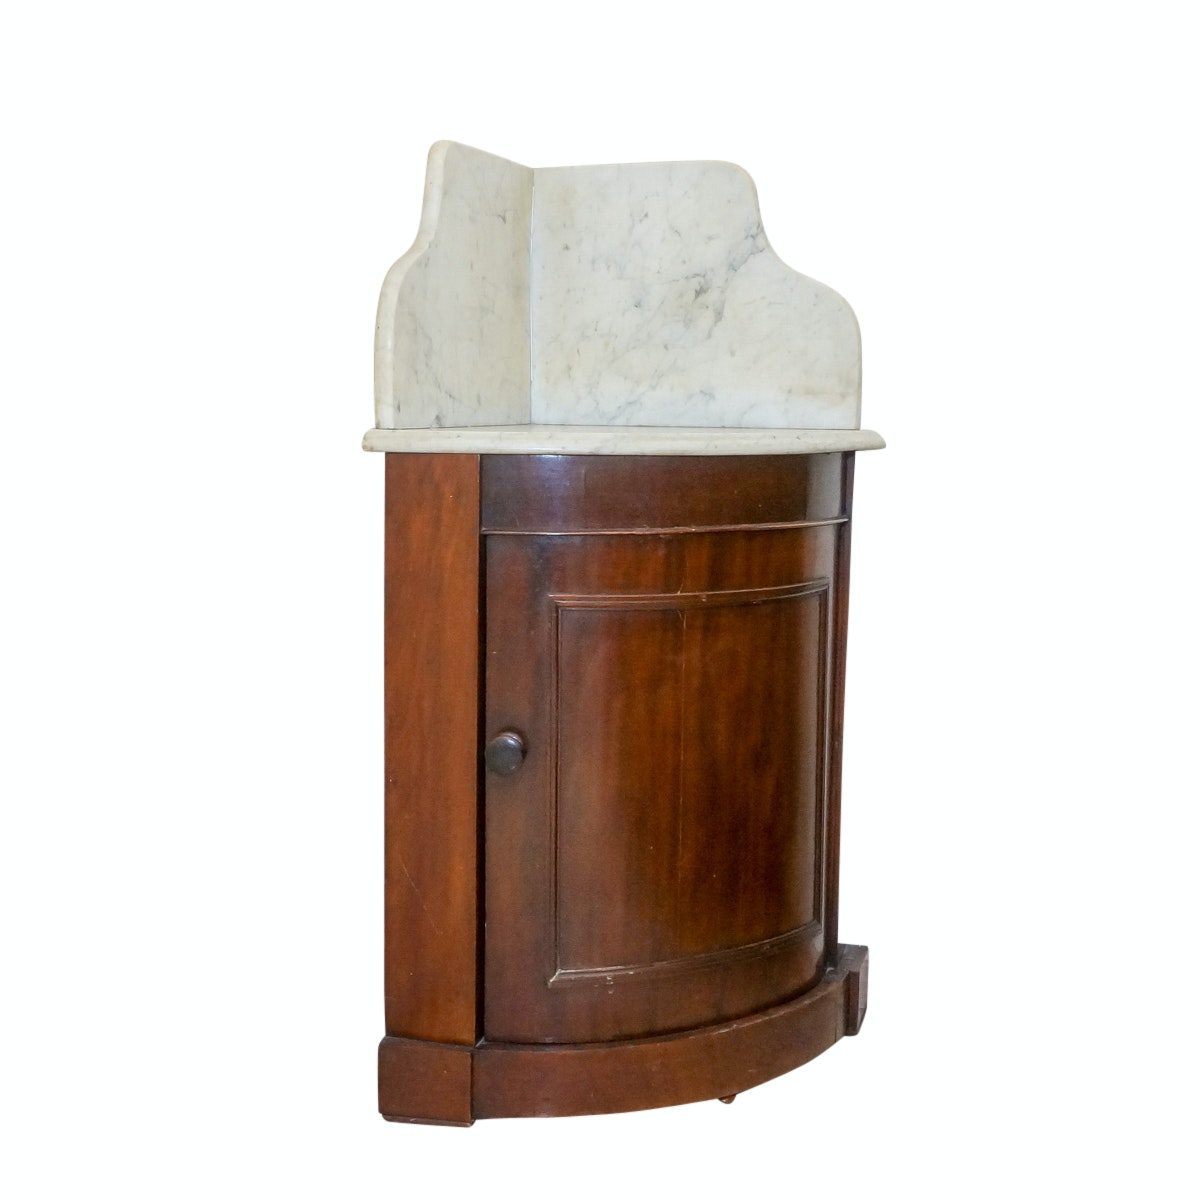 Vintage Marble-Topped Wood Corner Cabinet Washstand